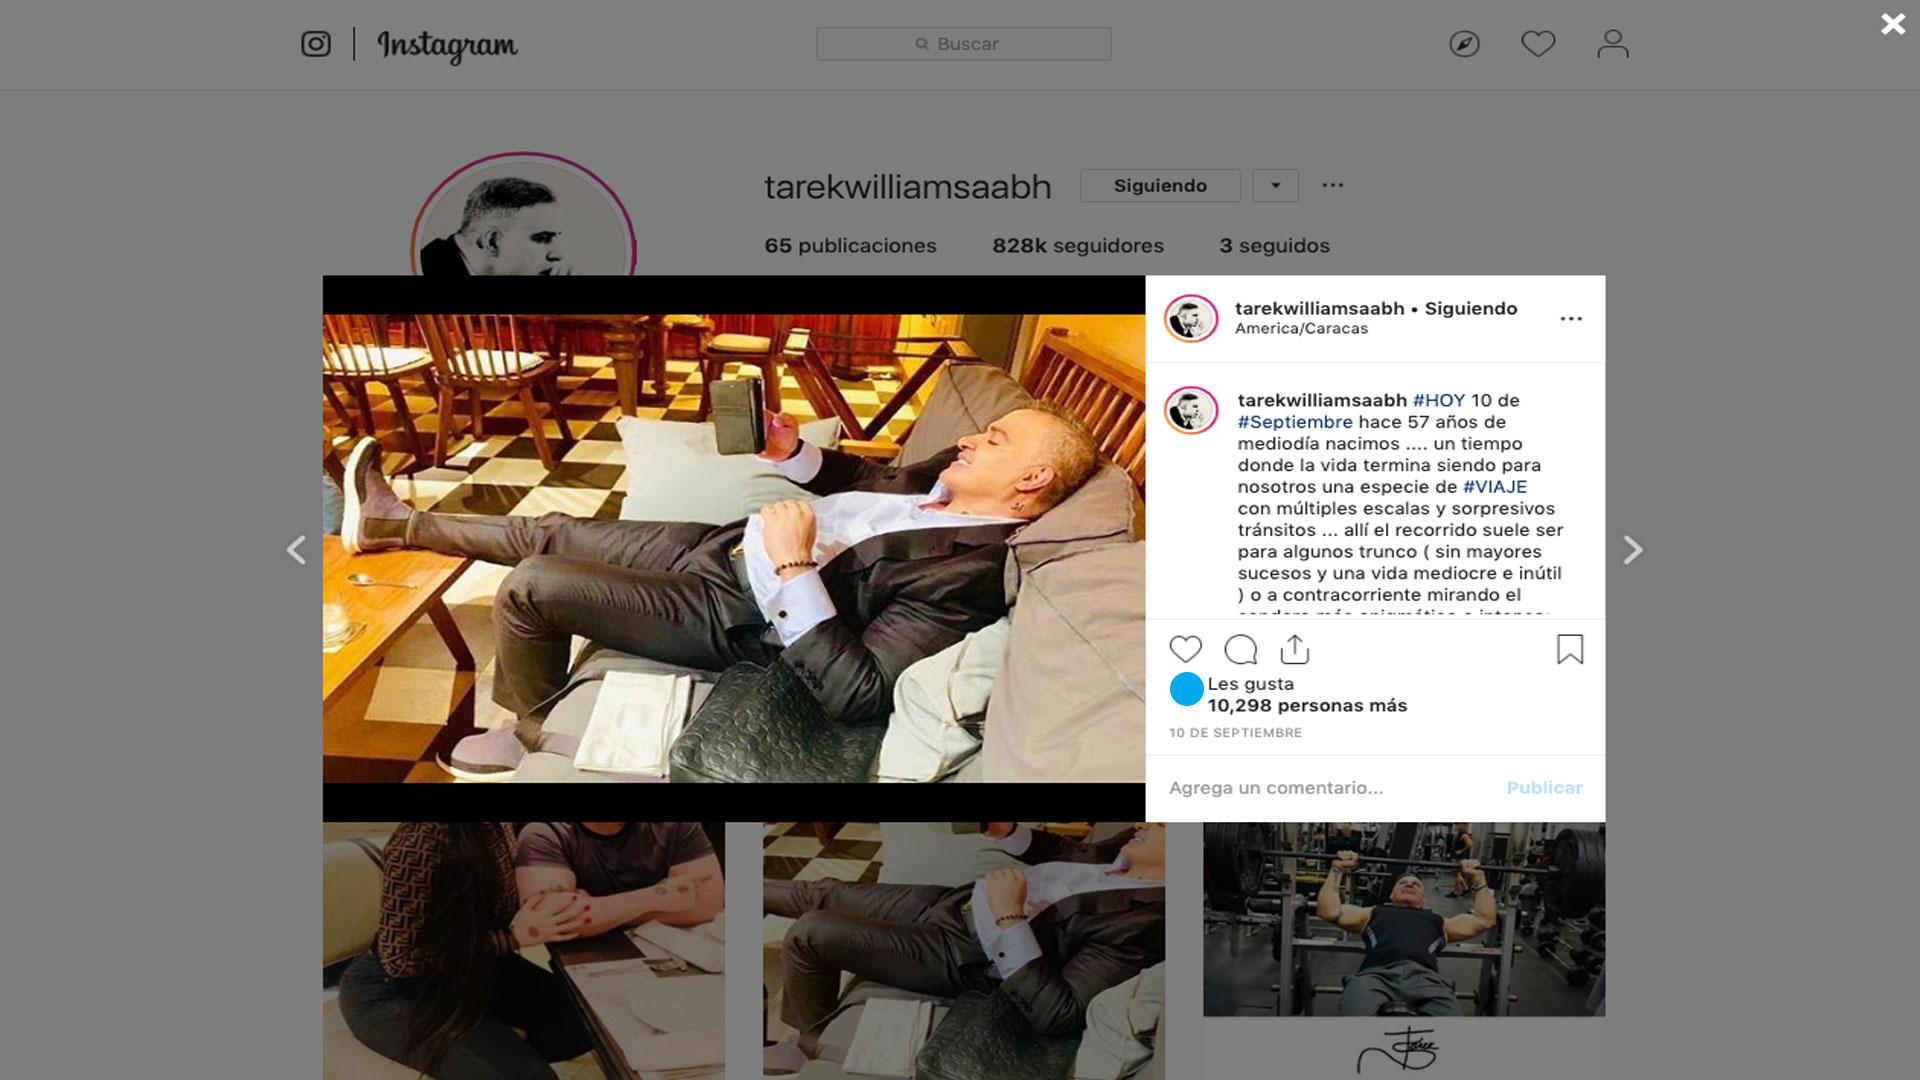 Tarek William Saab instagram